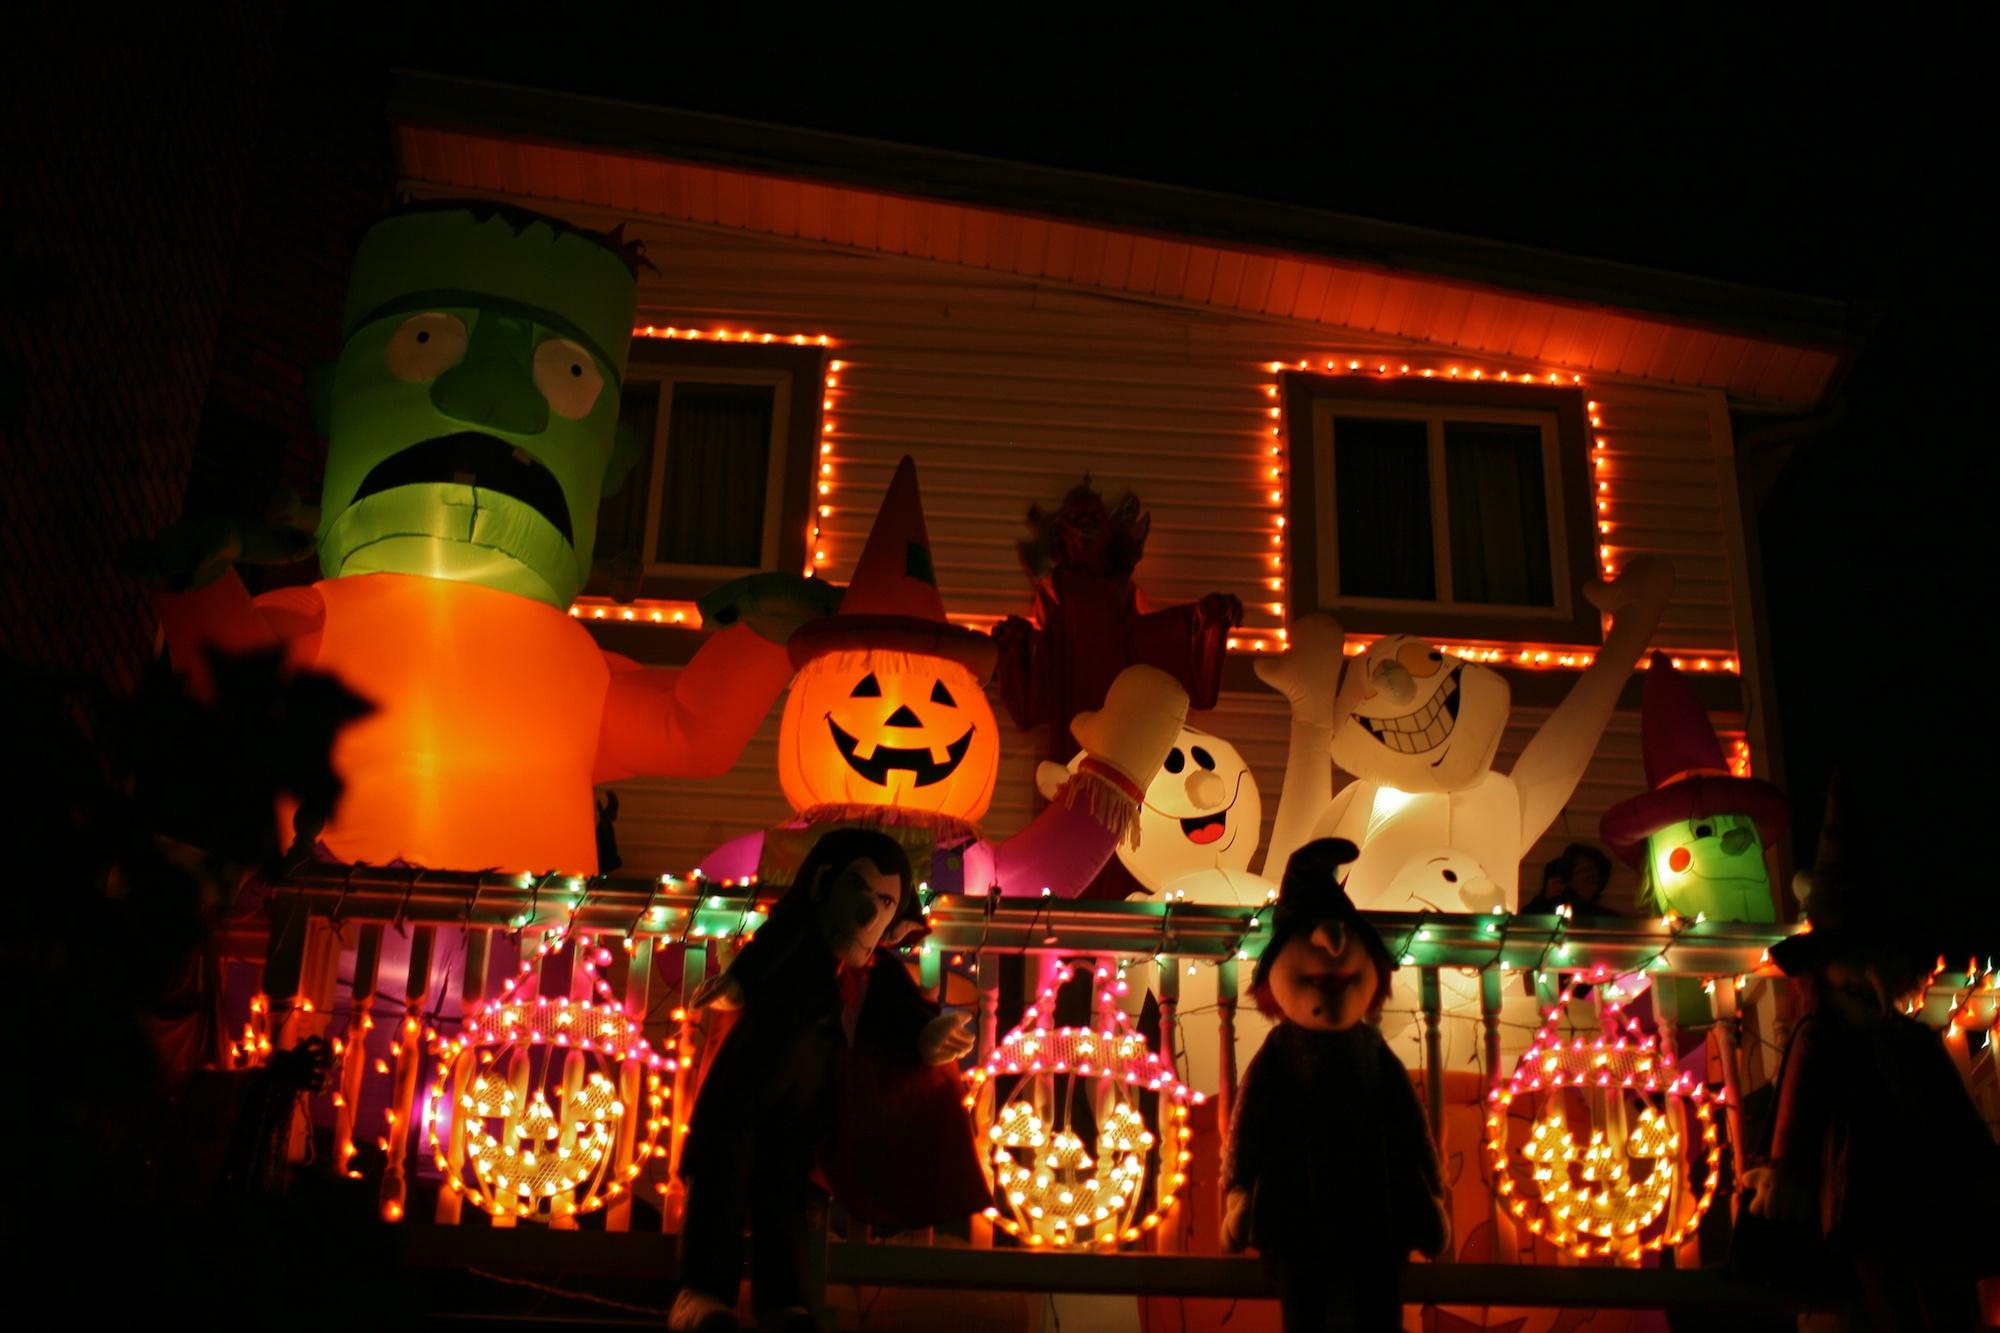 Outdoor inflatable halloween decorations - Outdoor Inflatable Halloween Decorations Halloween House Download